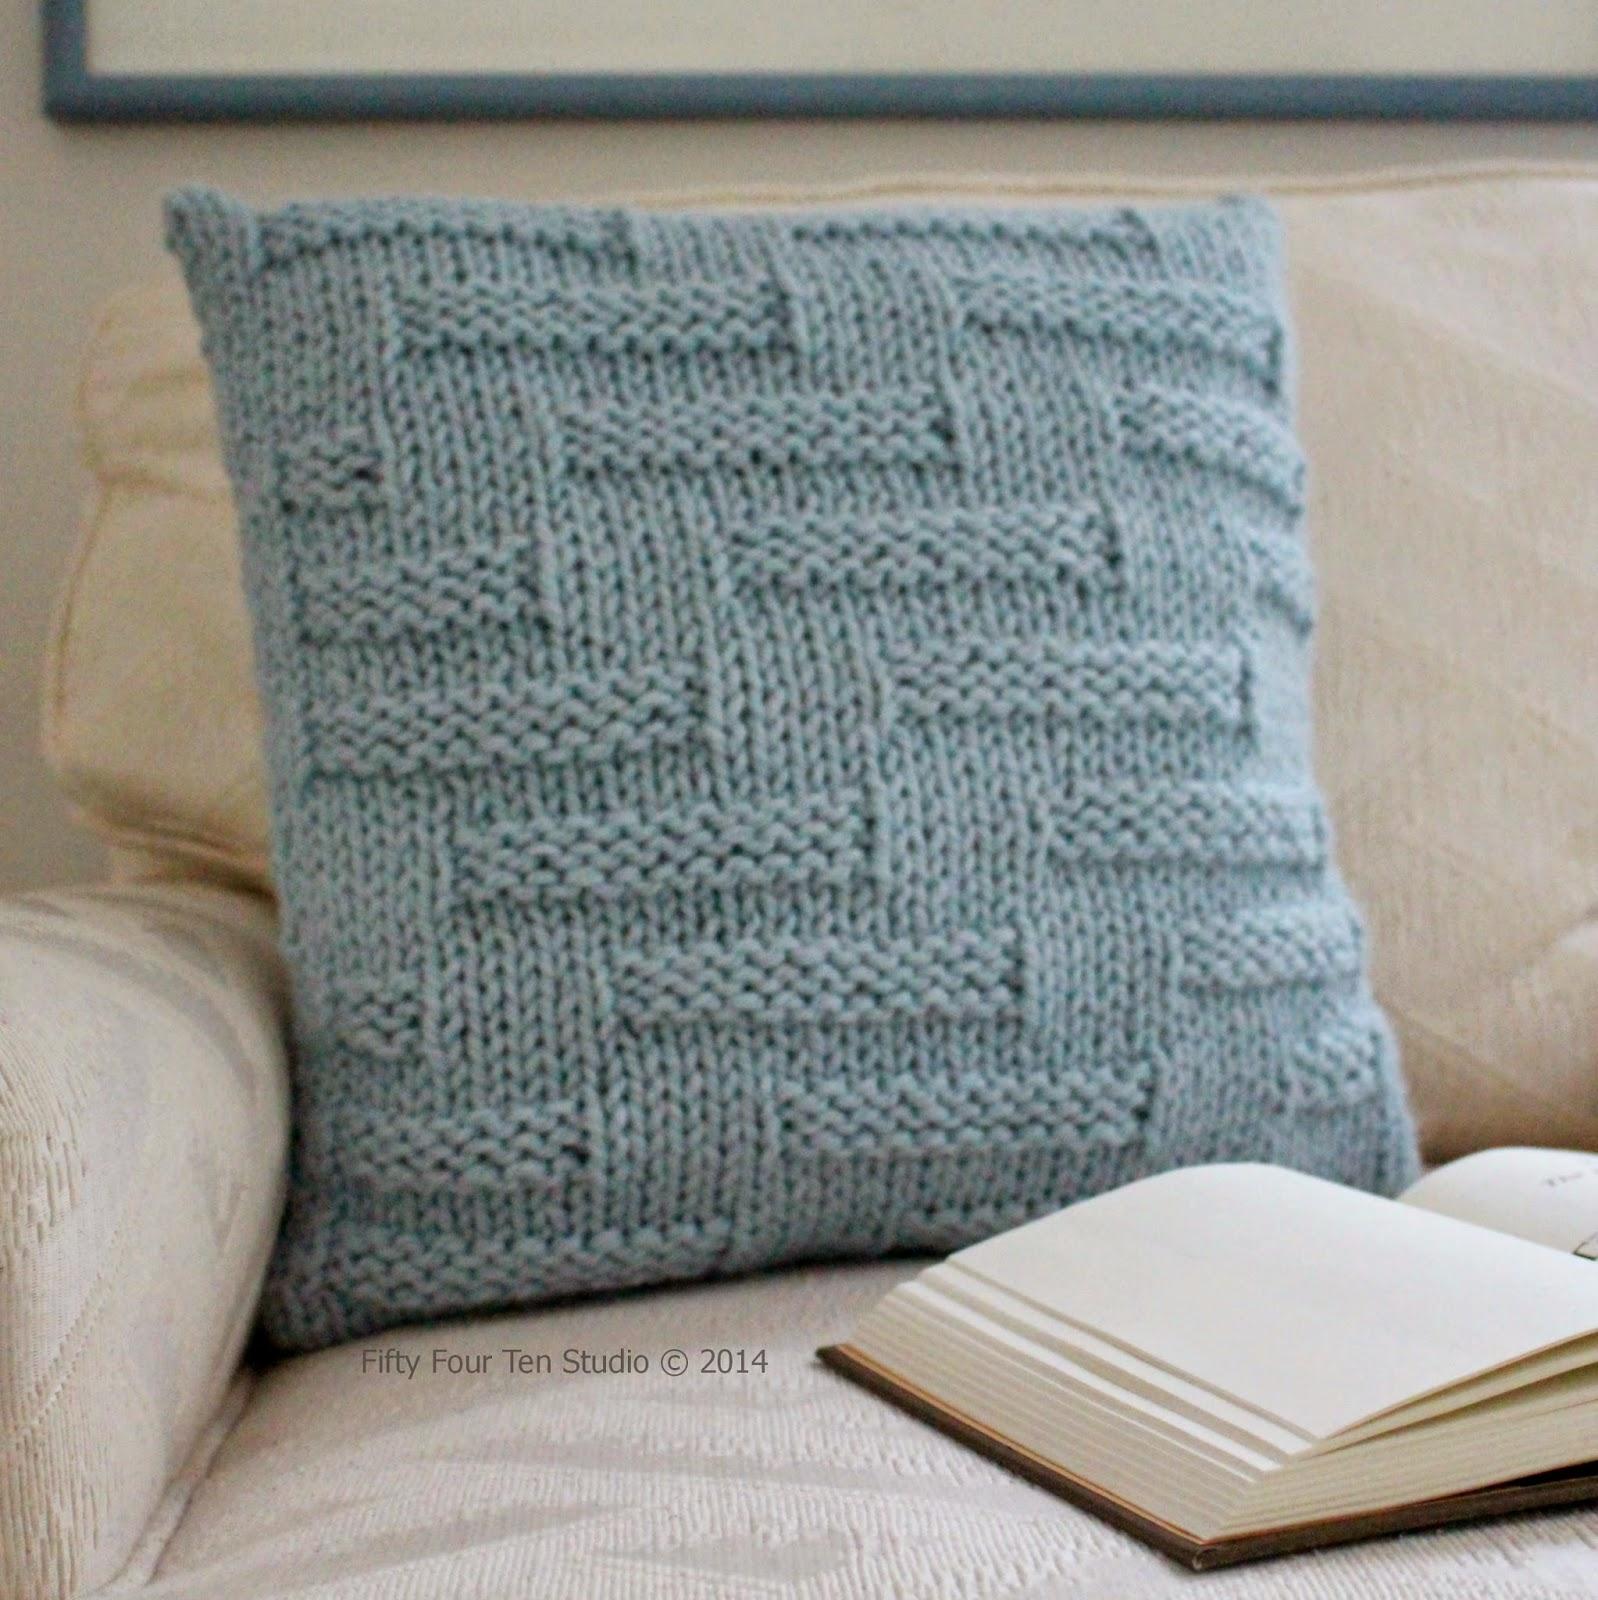 Pillow Knitting Pattern : Fifty Four Ten Studio: